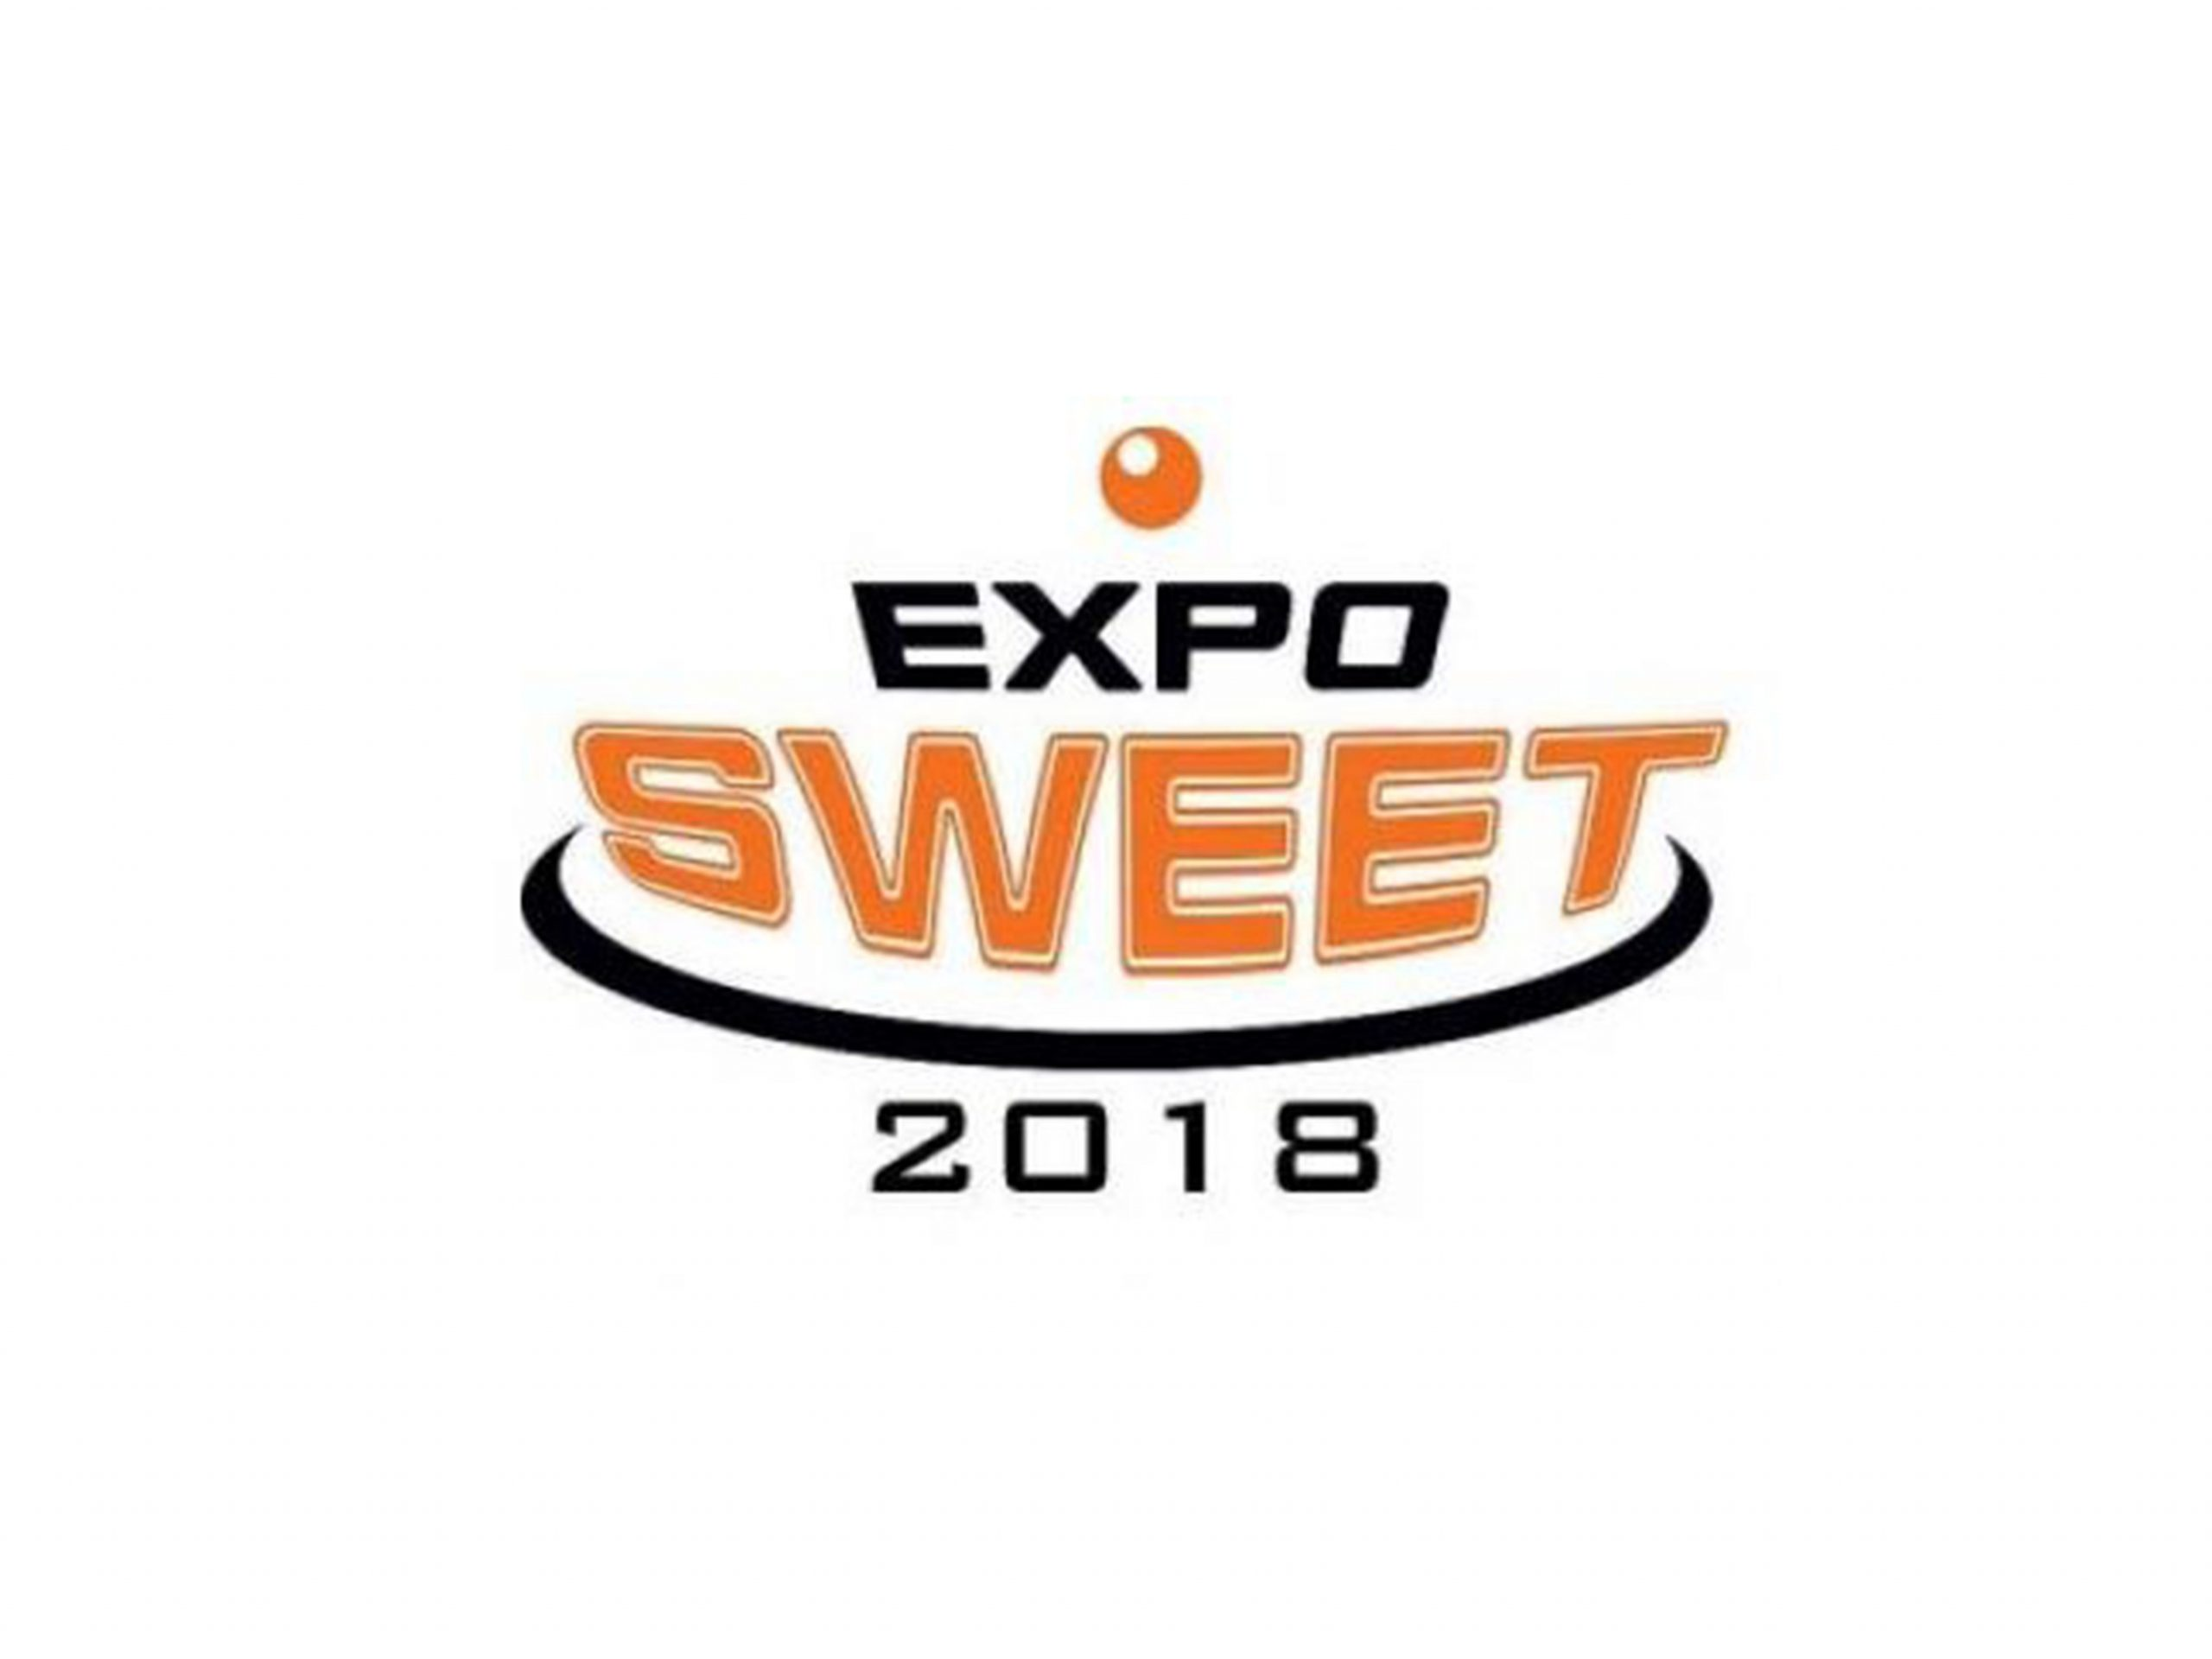 TARGI EXPO SWEET 2018